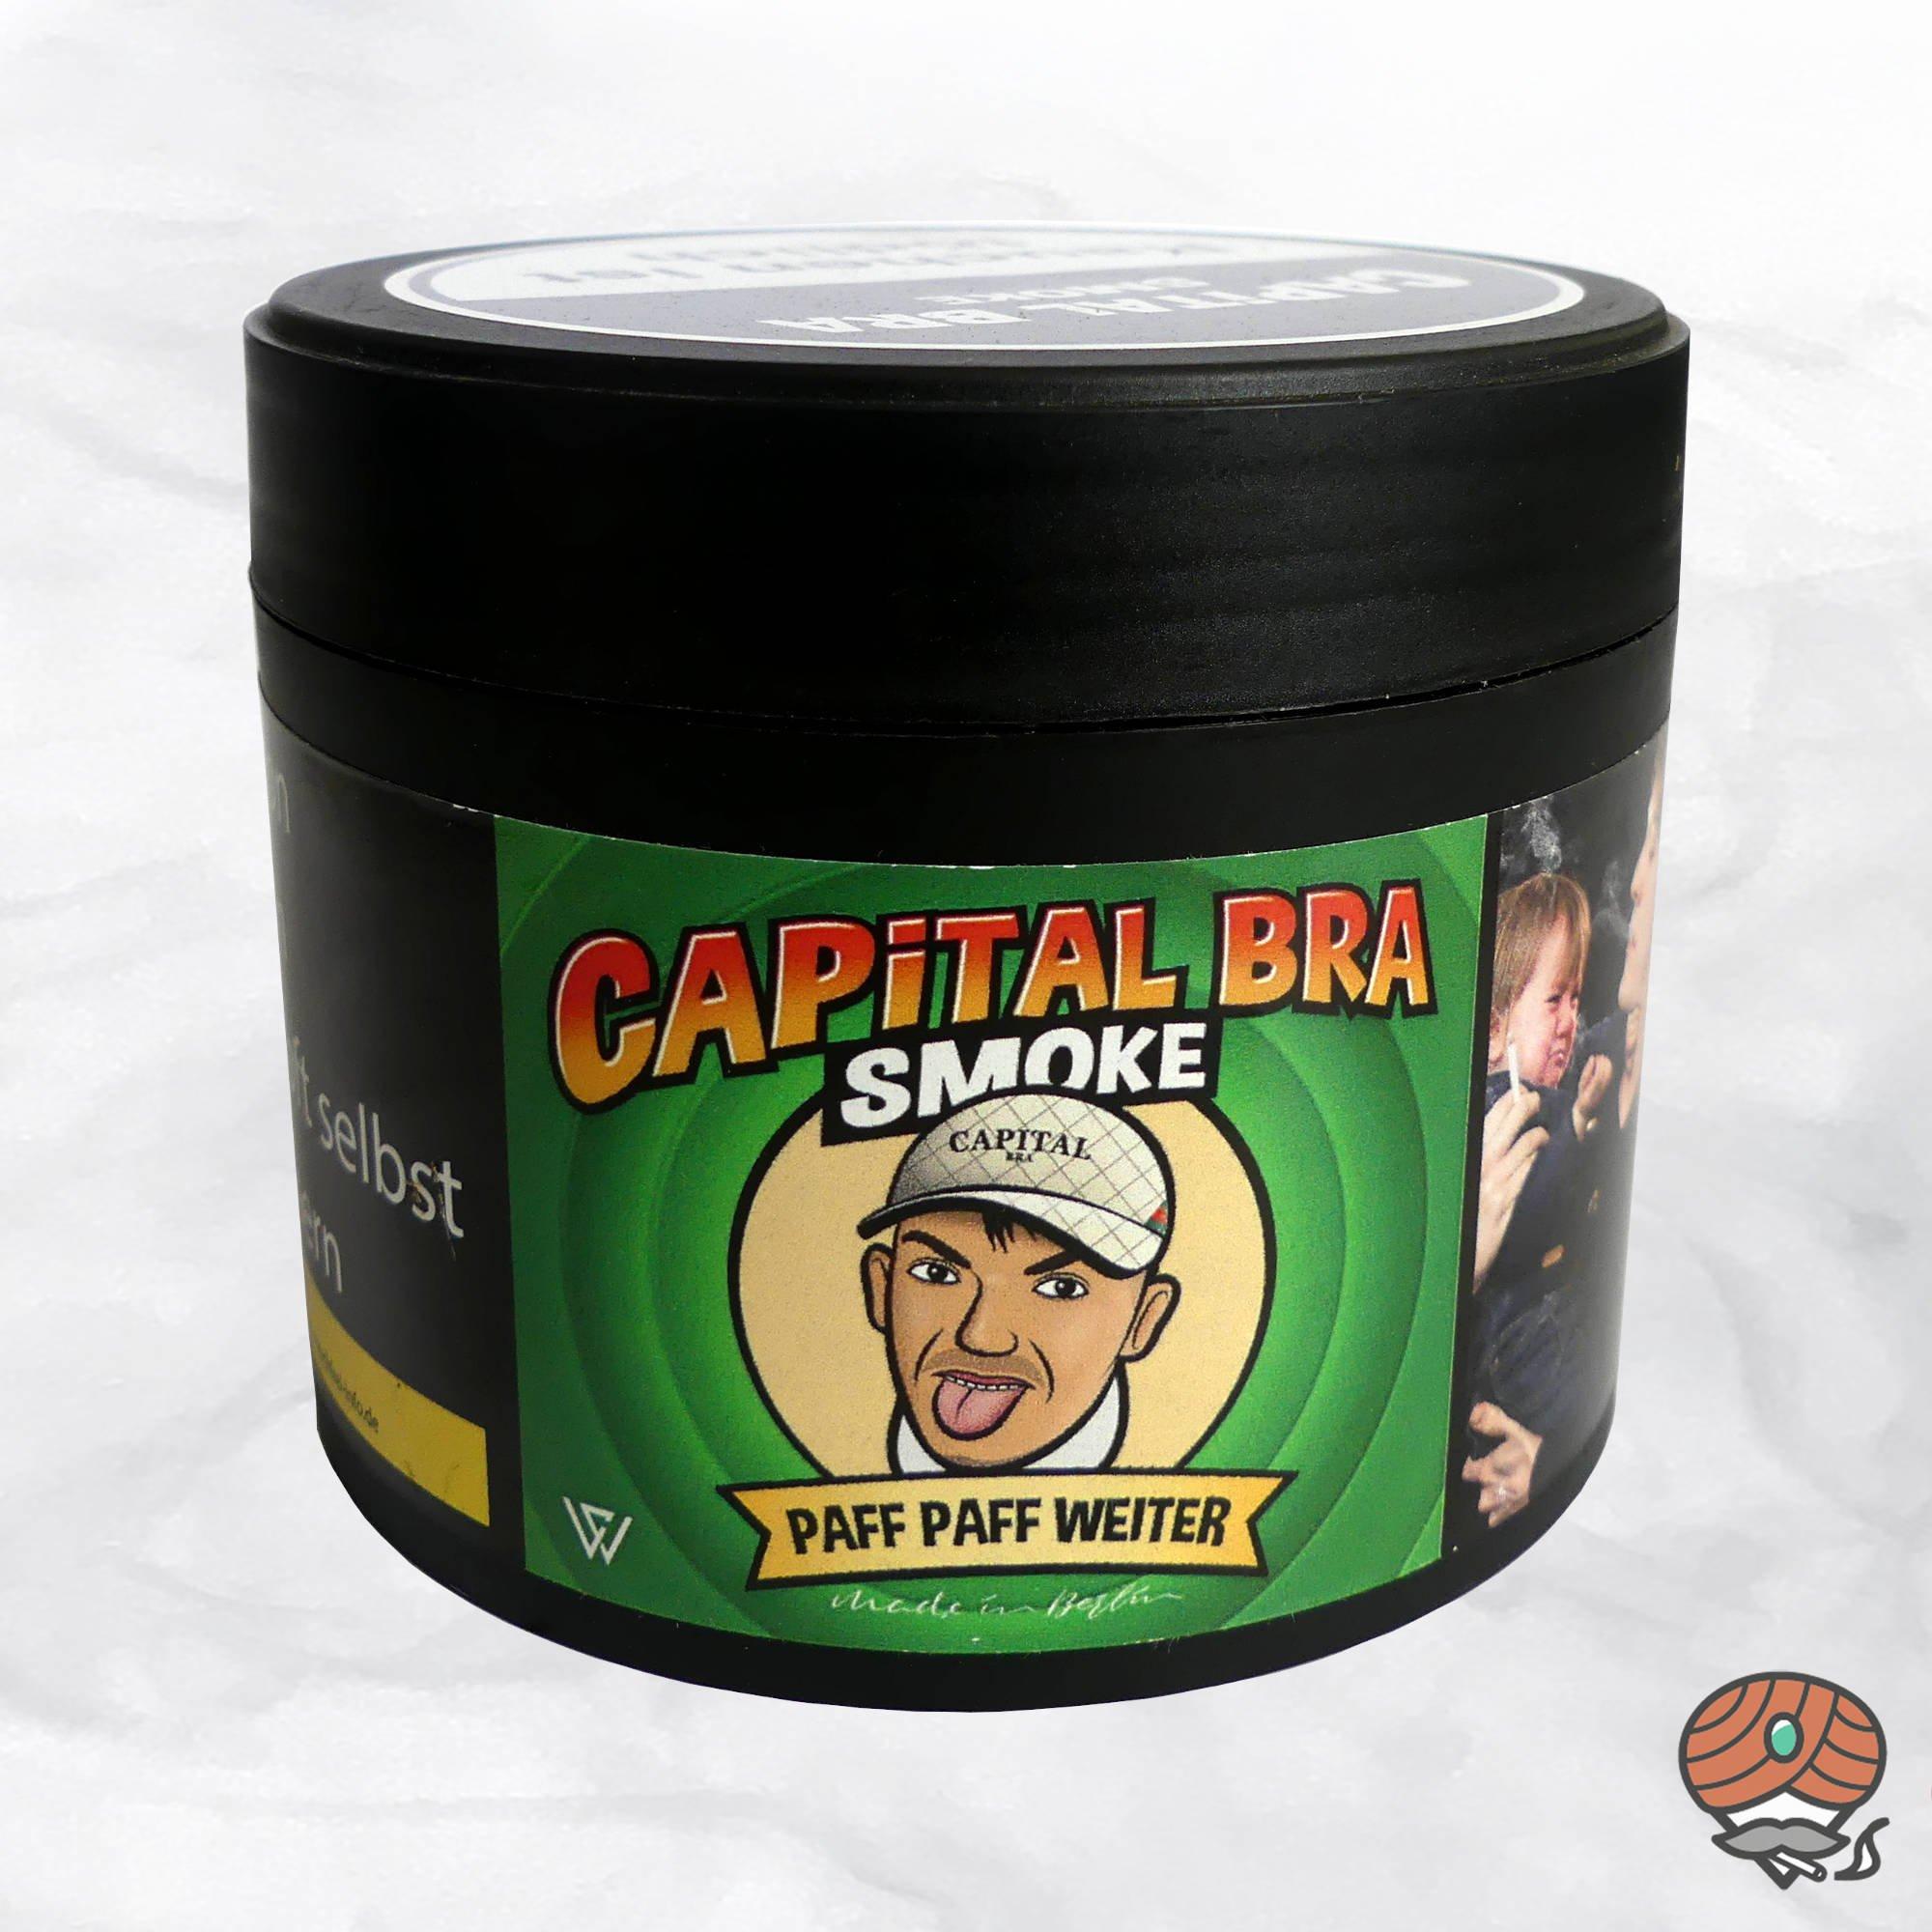 Capital Bra Smoke Shisha Tabak - Paff Paff Weiter 200g